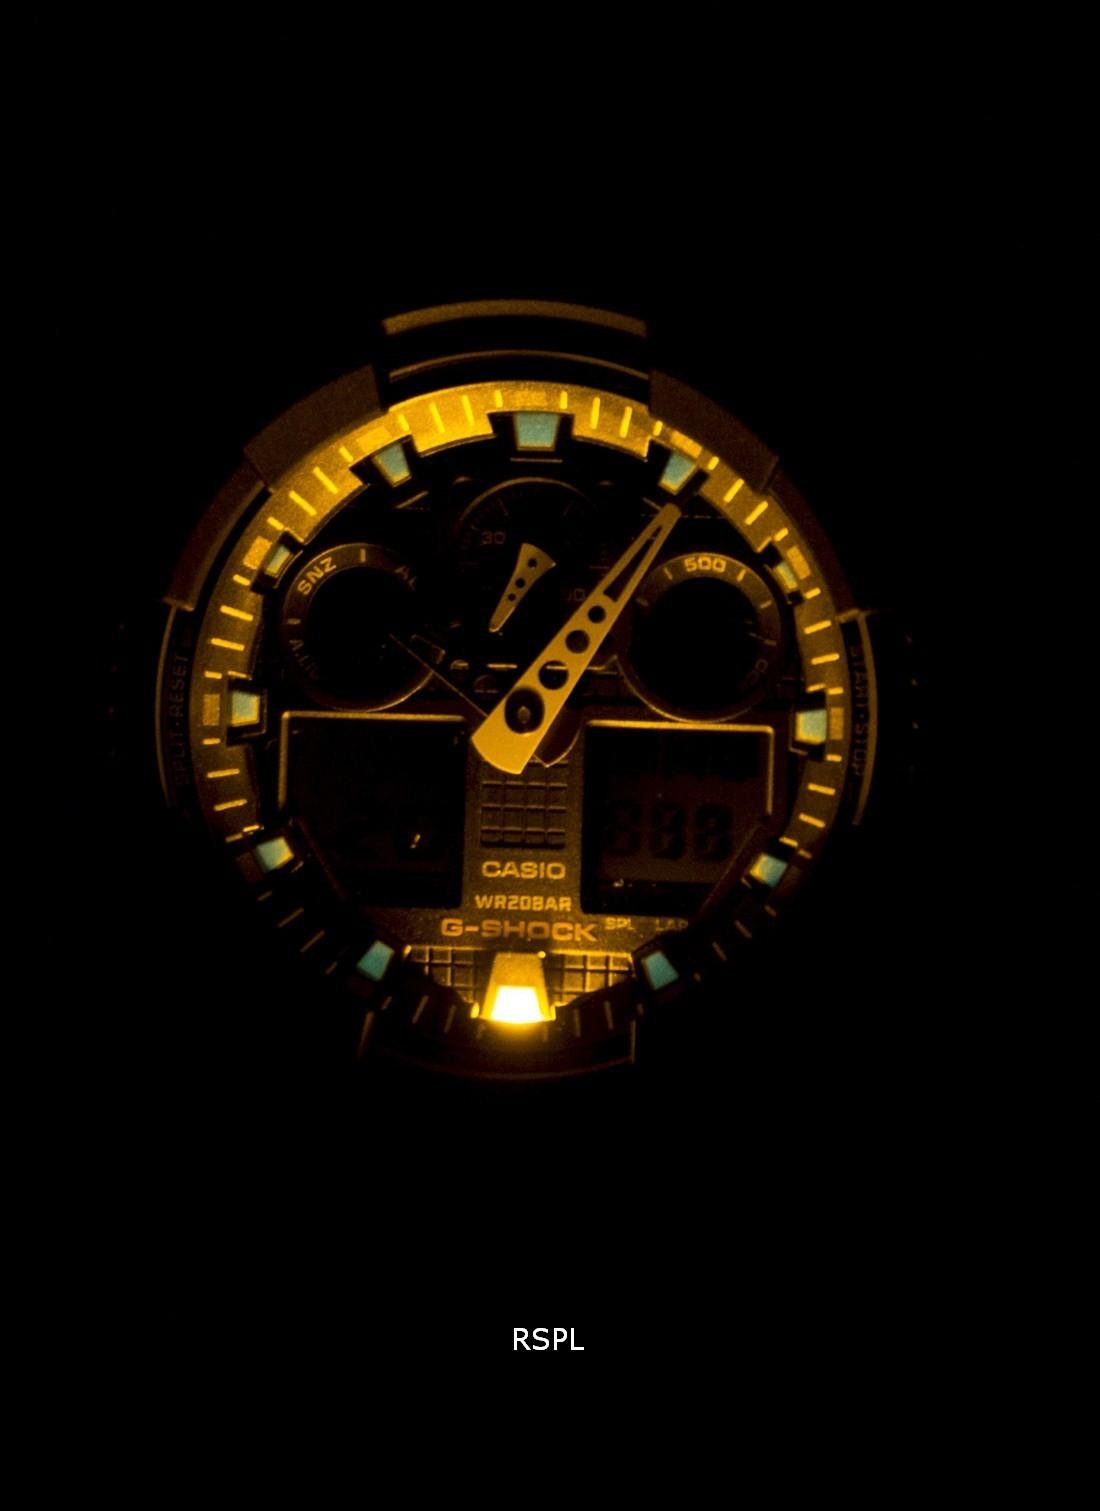 Casio-G-Shock-Velocity-Indicator-Alarm-GA-100-1A4-GA100-1A4-Mens-Watch 縮圖 2